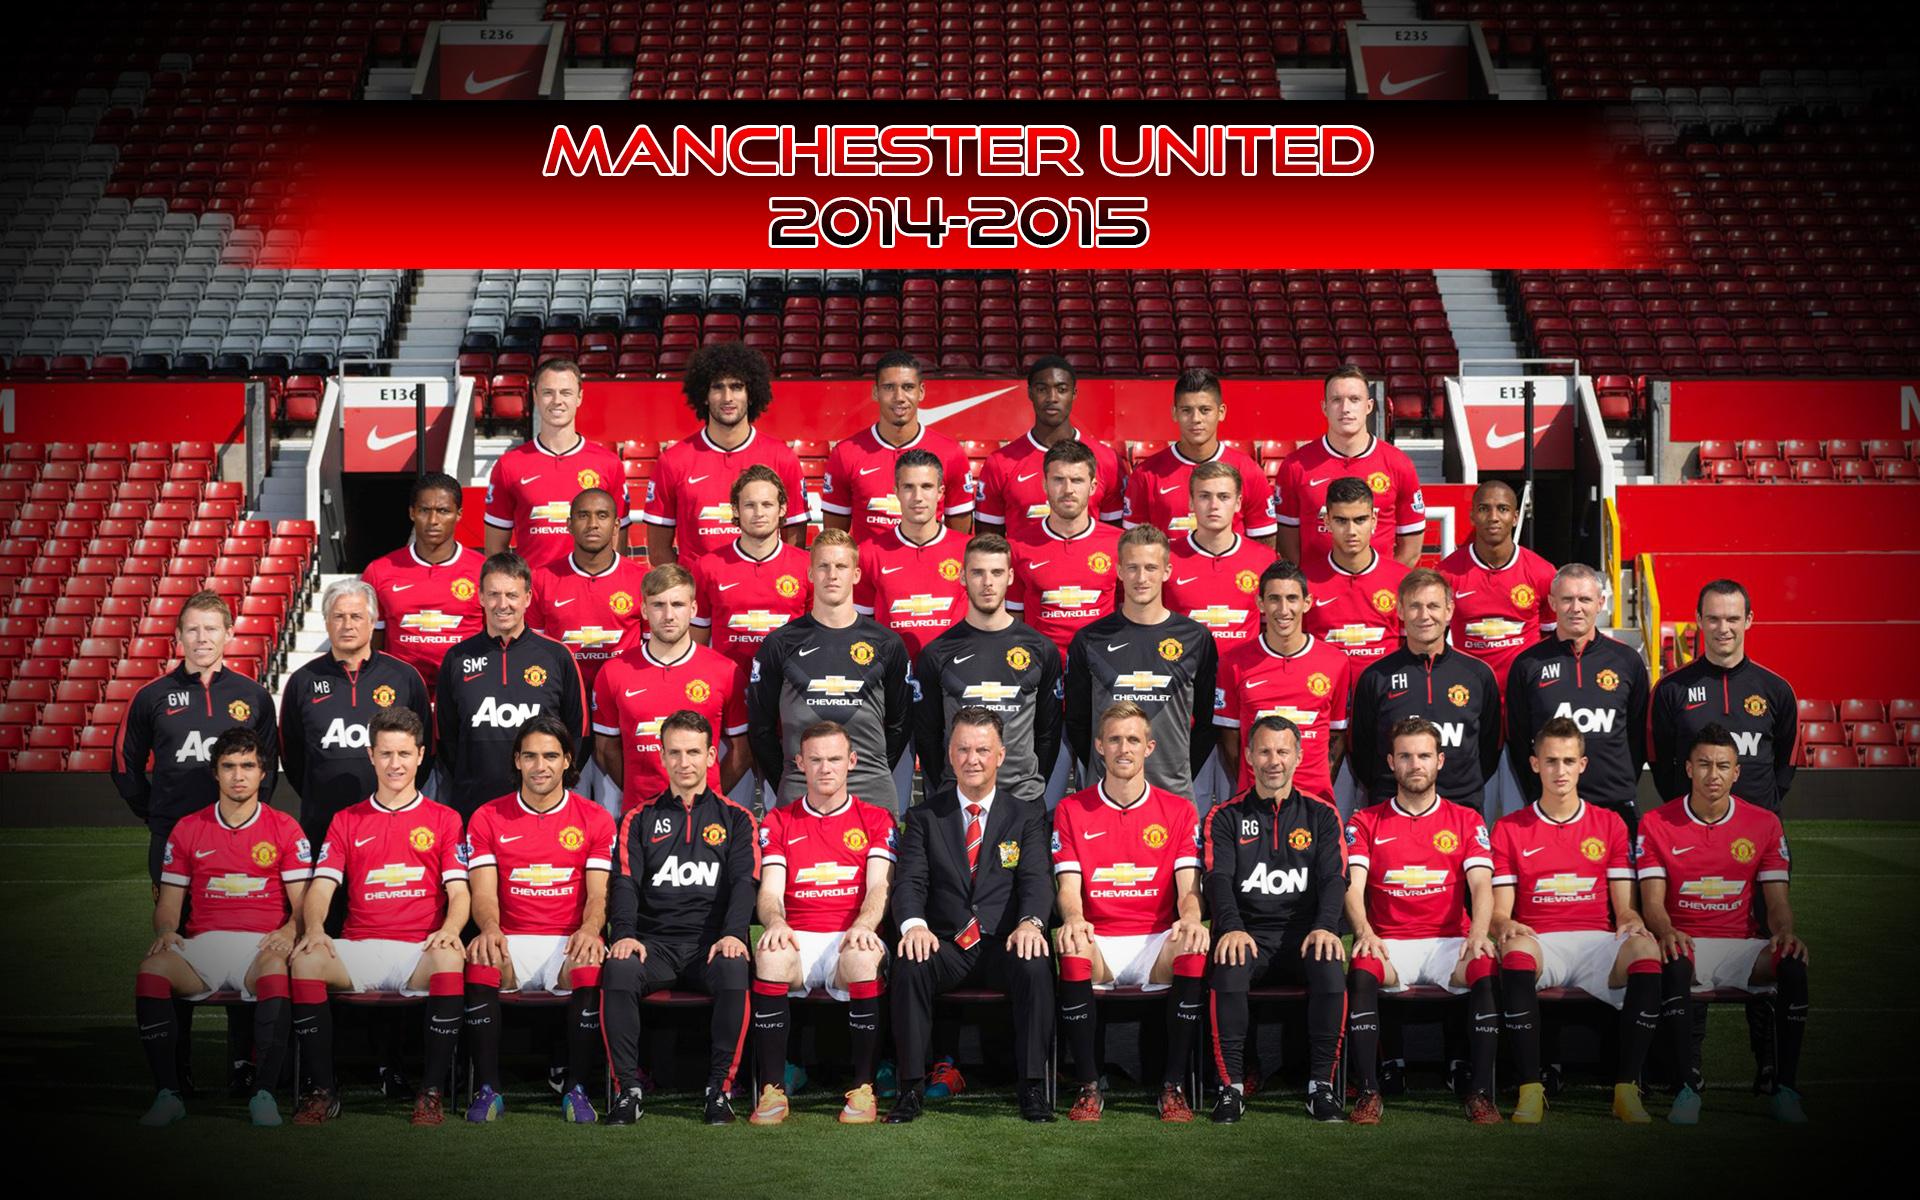 Man United Wallpaper